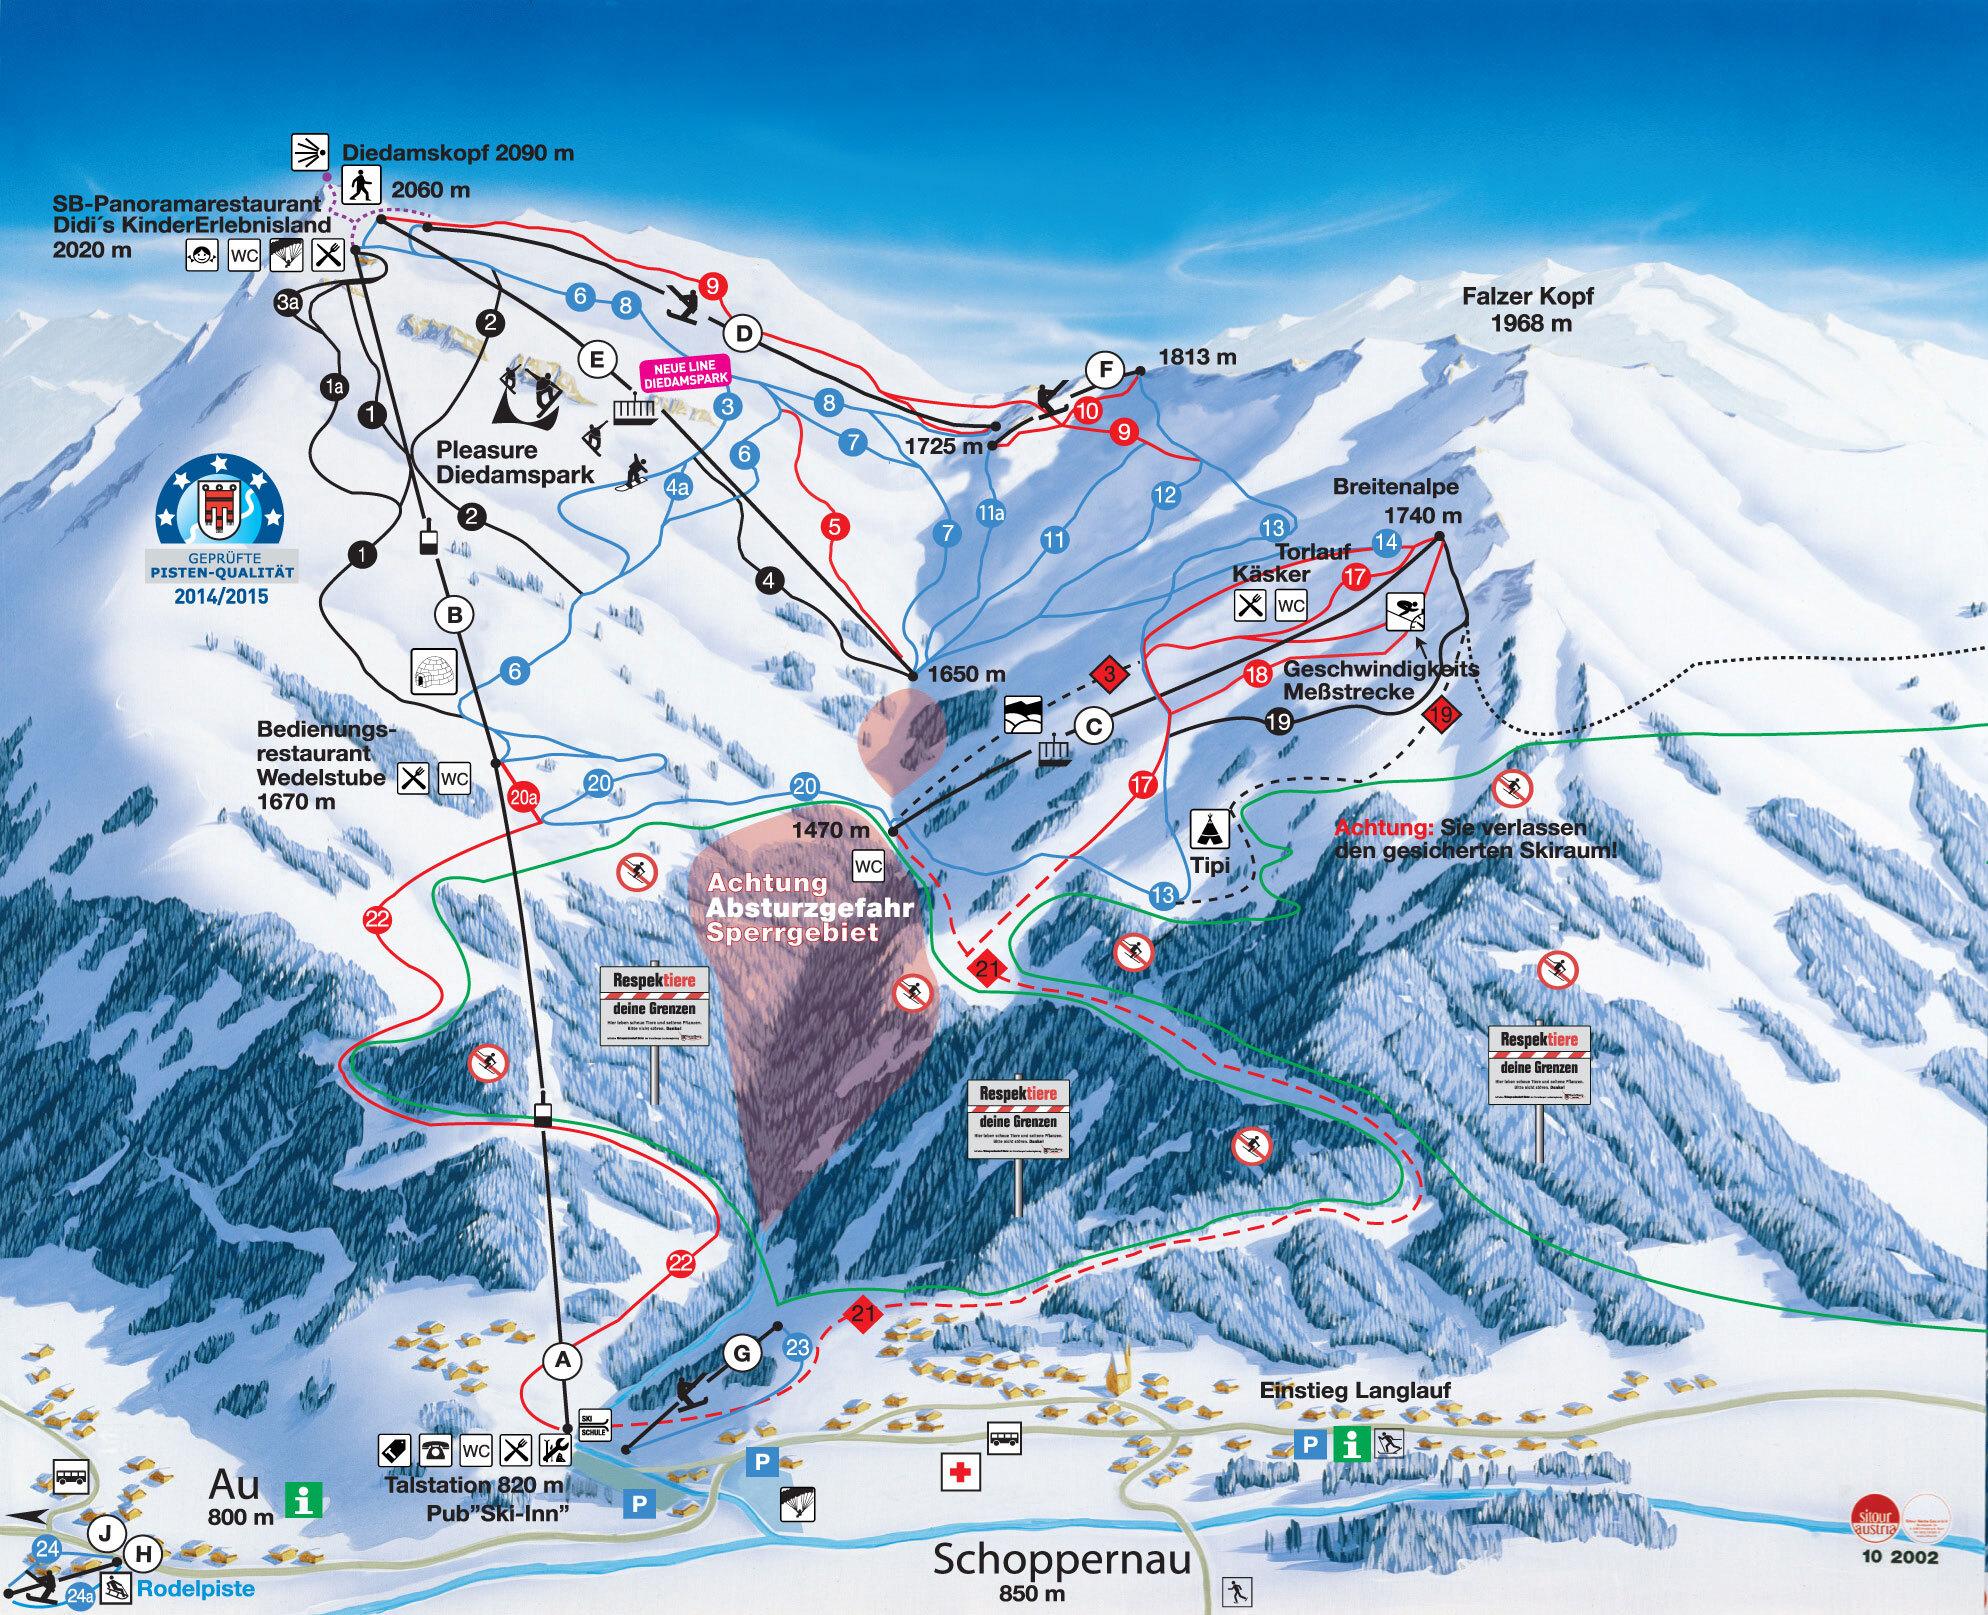 Diedamskopf Piste / Trail Map